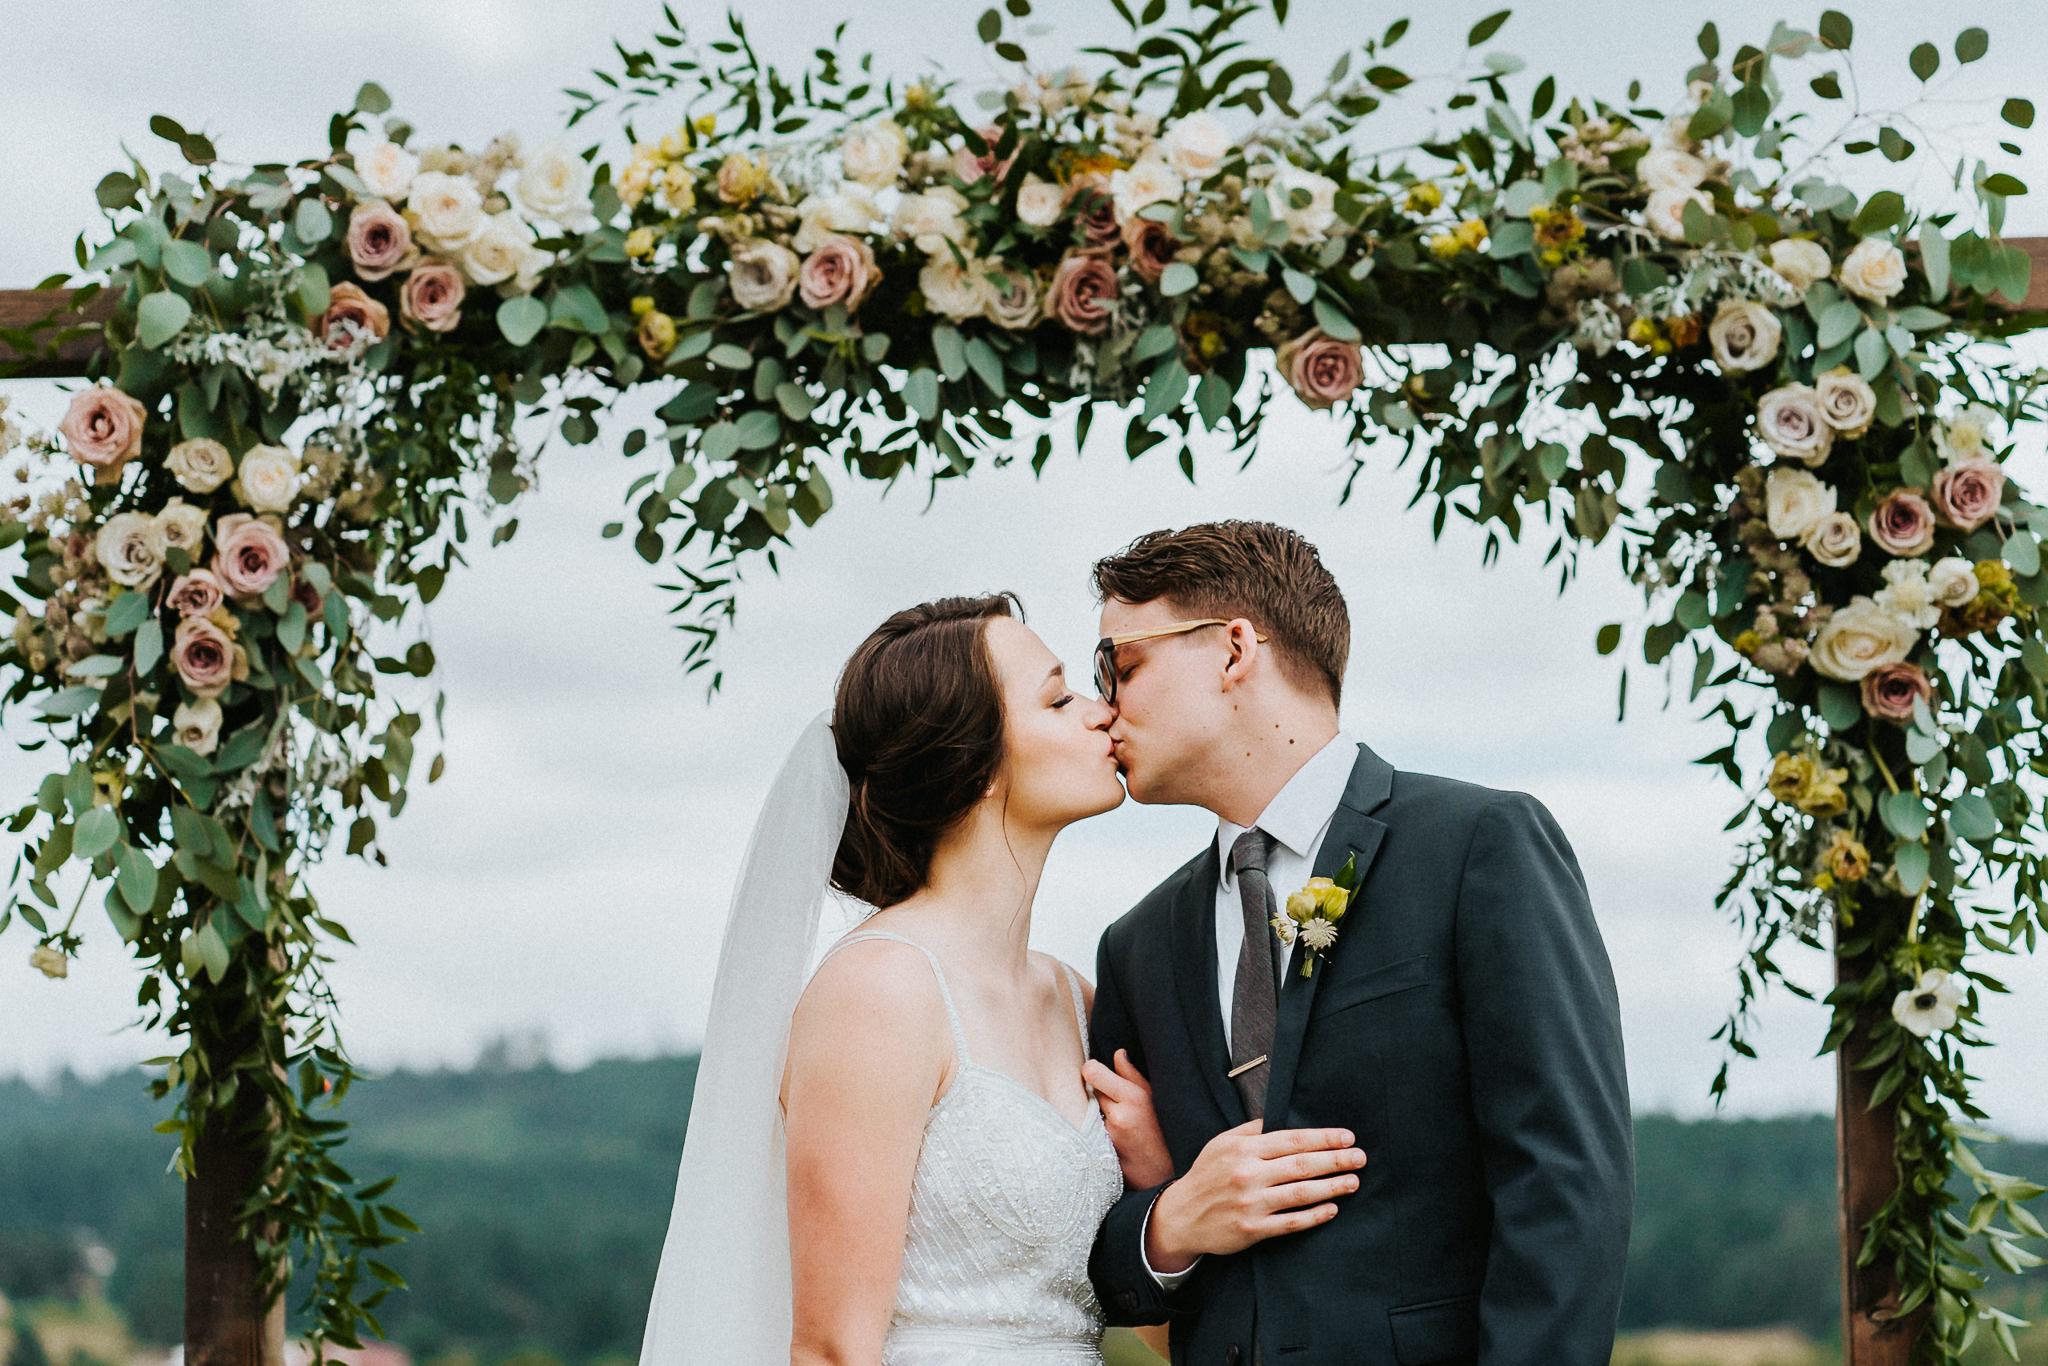 Bride Groom Portrait Kiss True Vine Florals Portland Wedding Photographer Alfred Tang